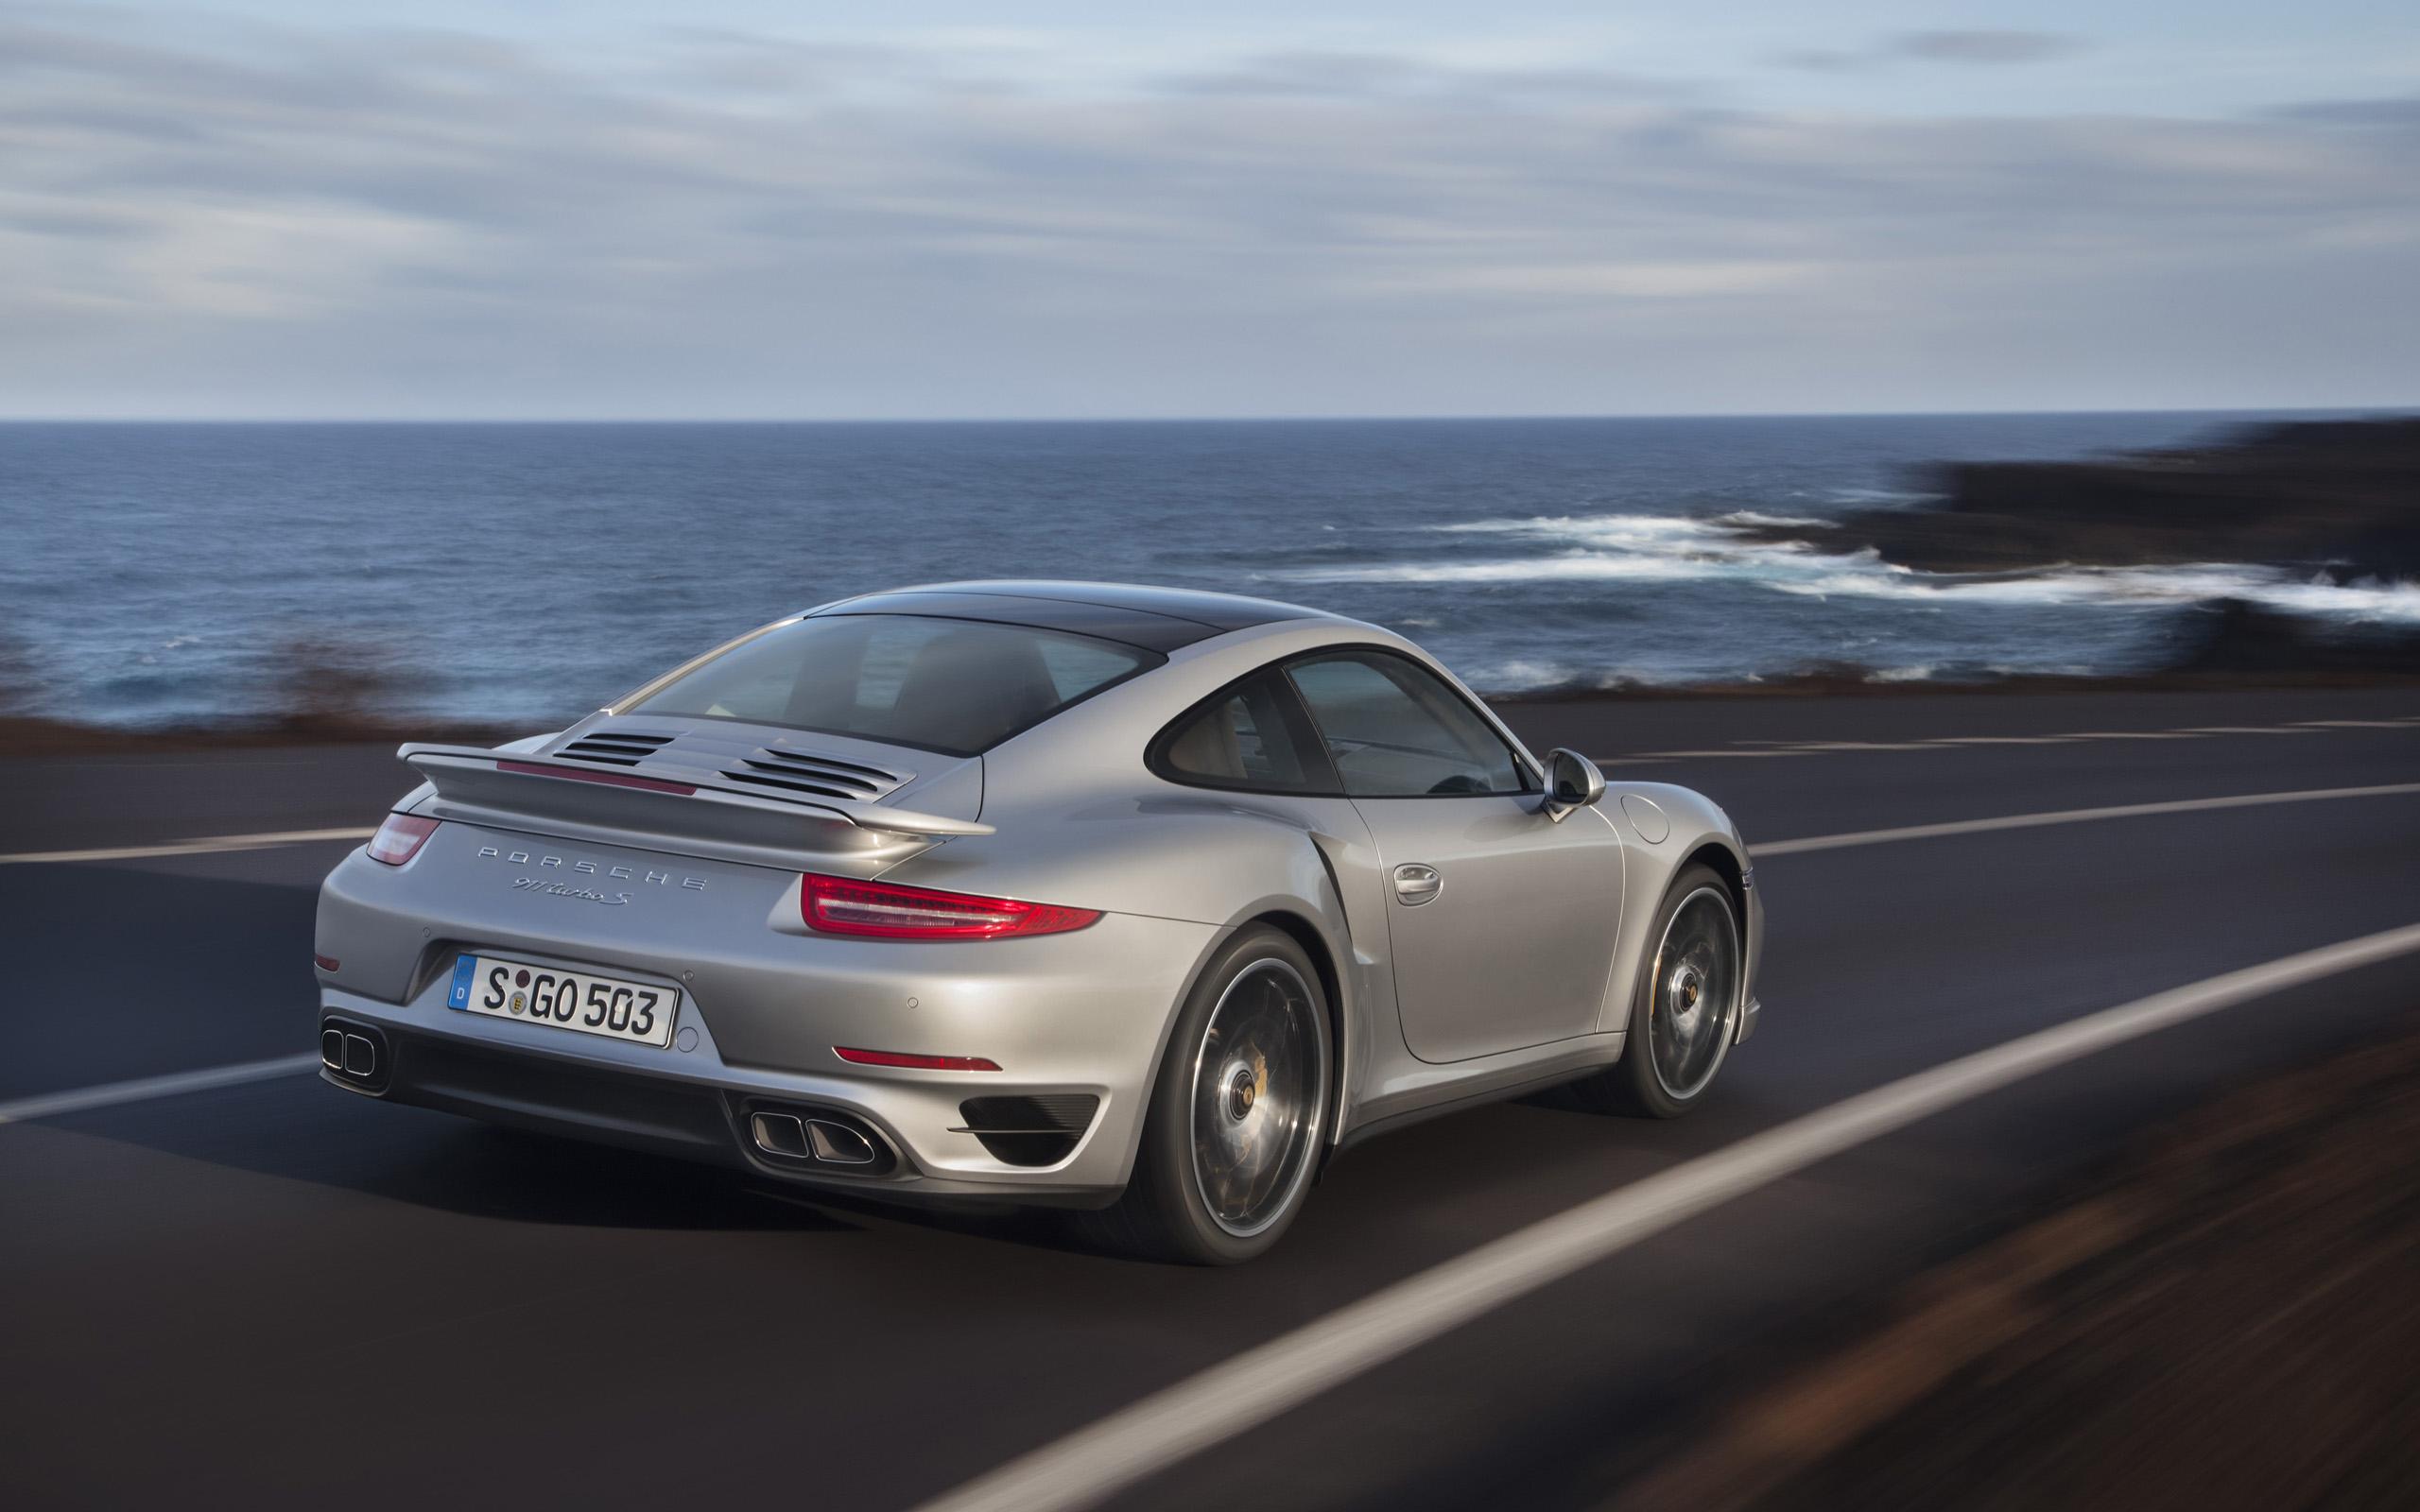 2013 Porsche 911 Turbo Motion Rear wallpapers 2013 Porsche 911 Turbo 2560x1600